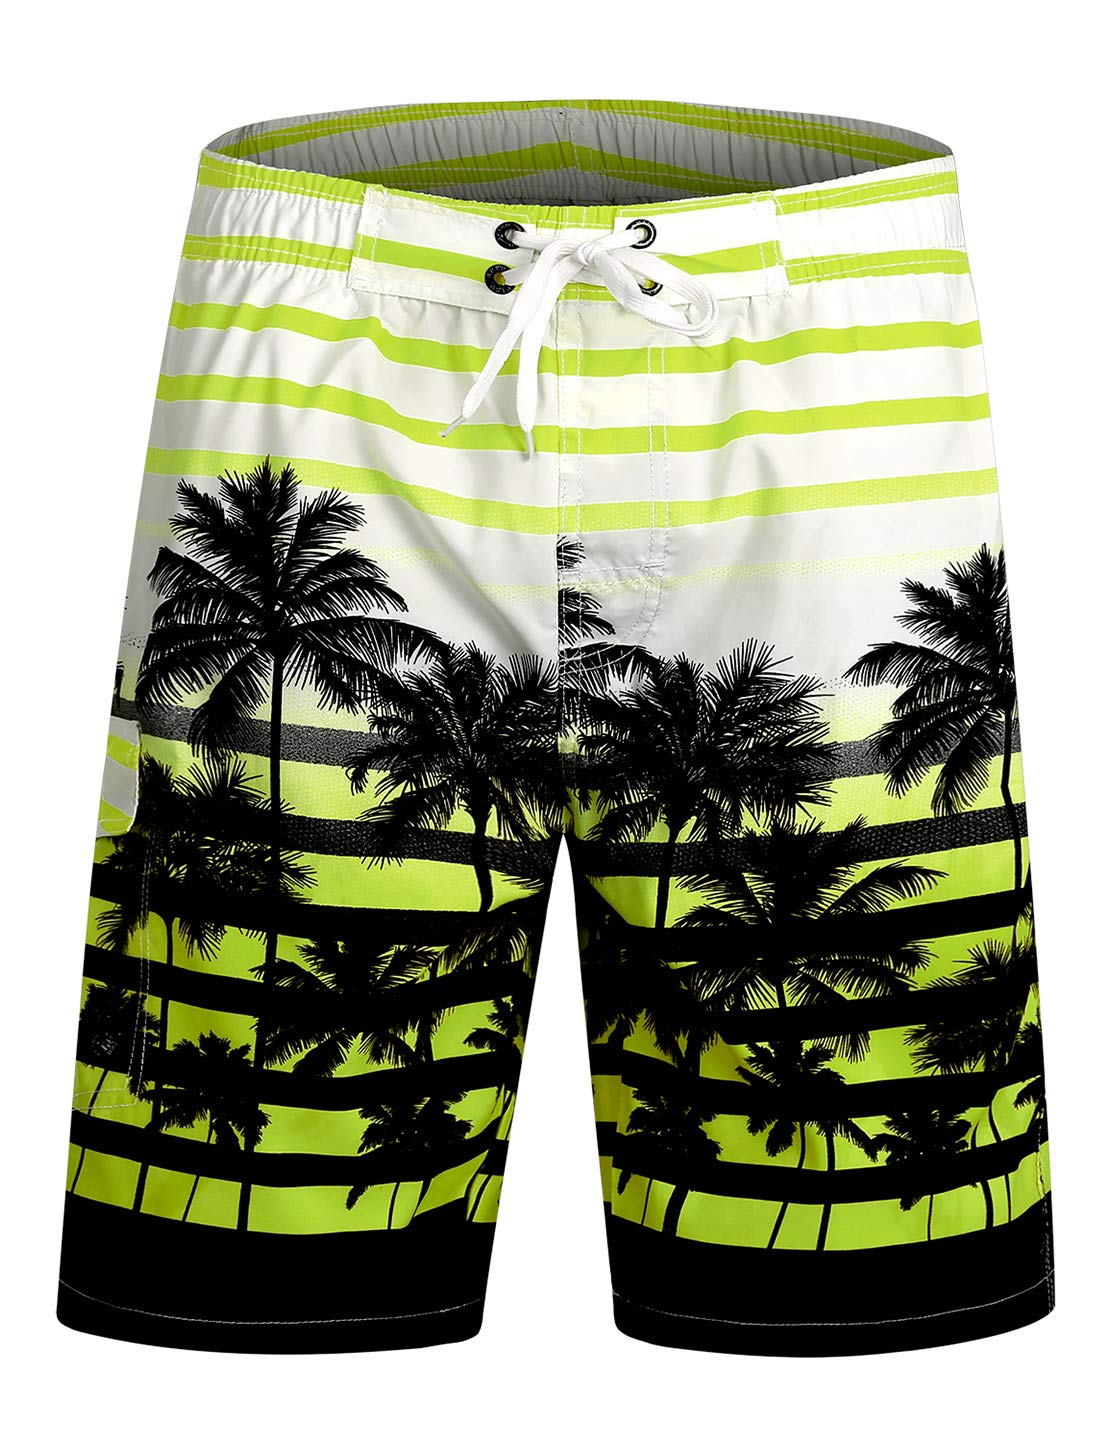 APTRO Swim Trunks Bathing Suits Men Hawaiian Shorts DZSK #1525 Green XL by APTRO